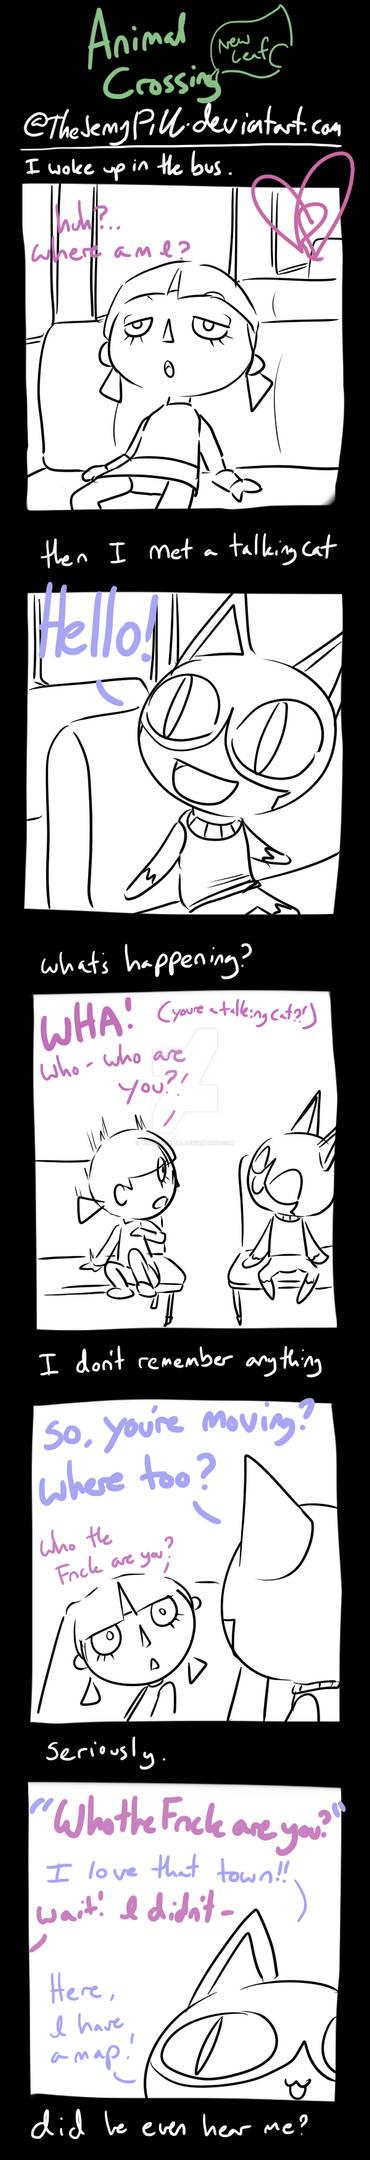 Animal Crossing New Leaf - comic 1